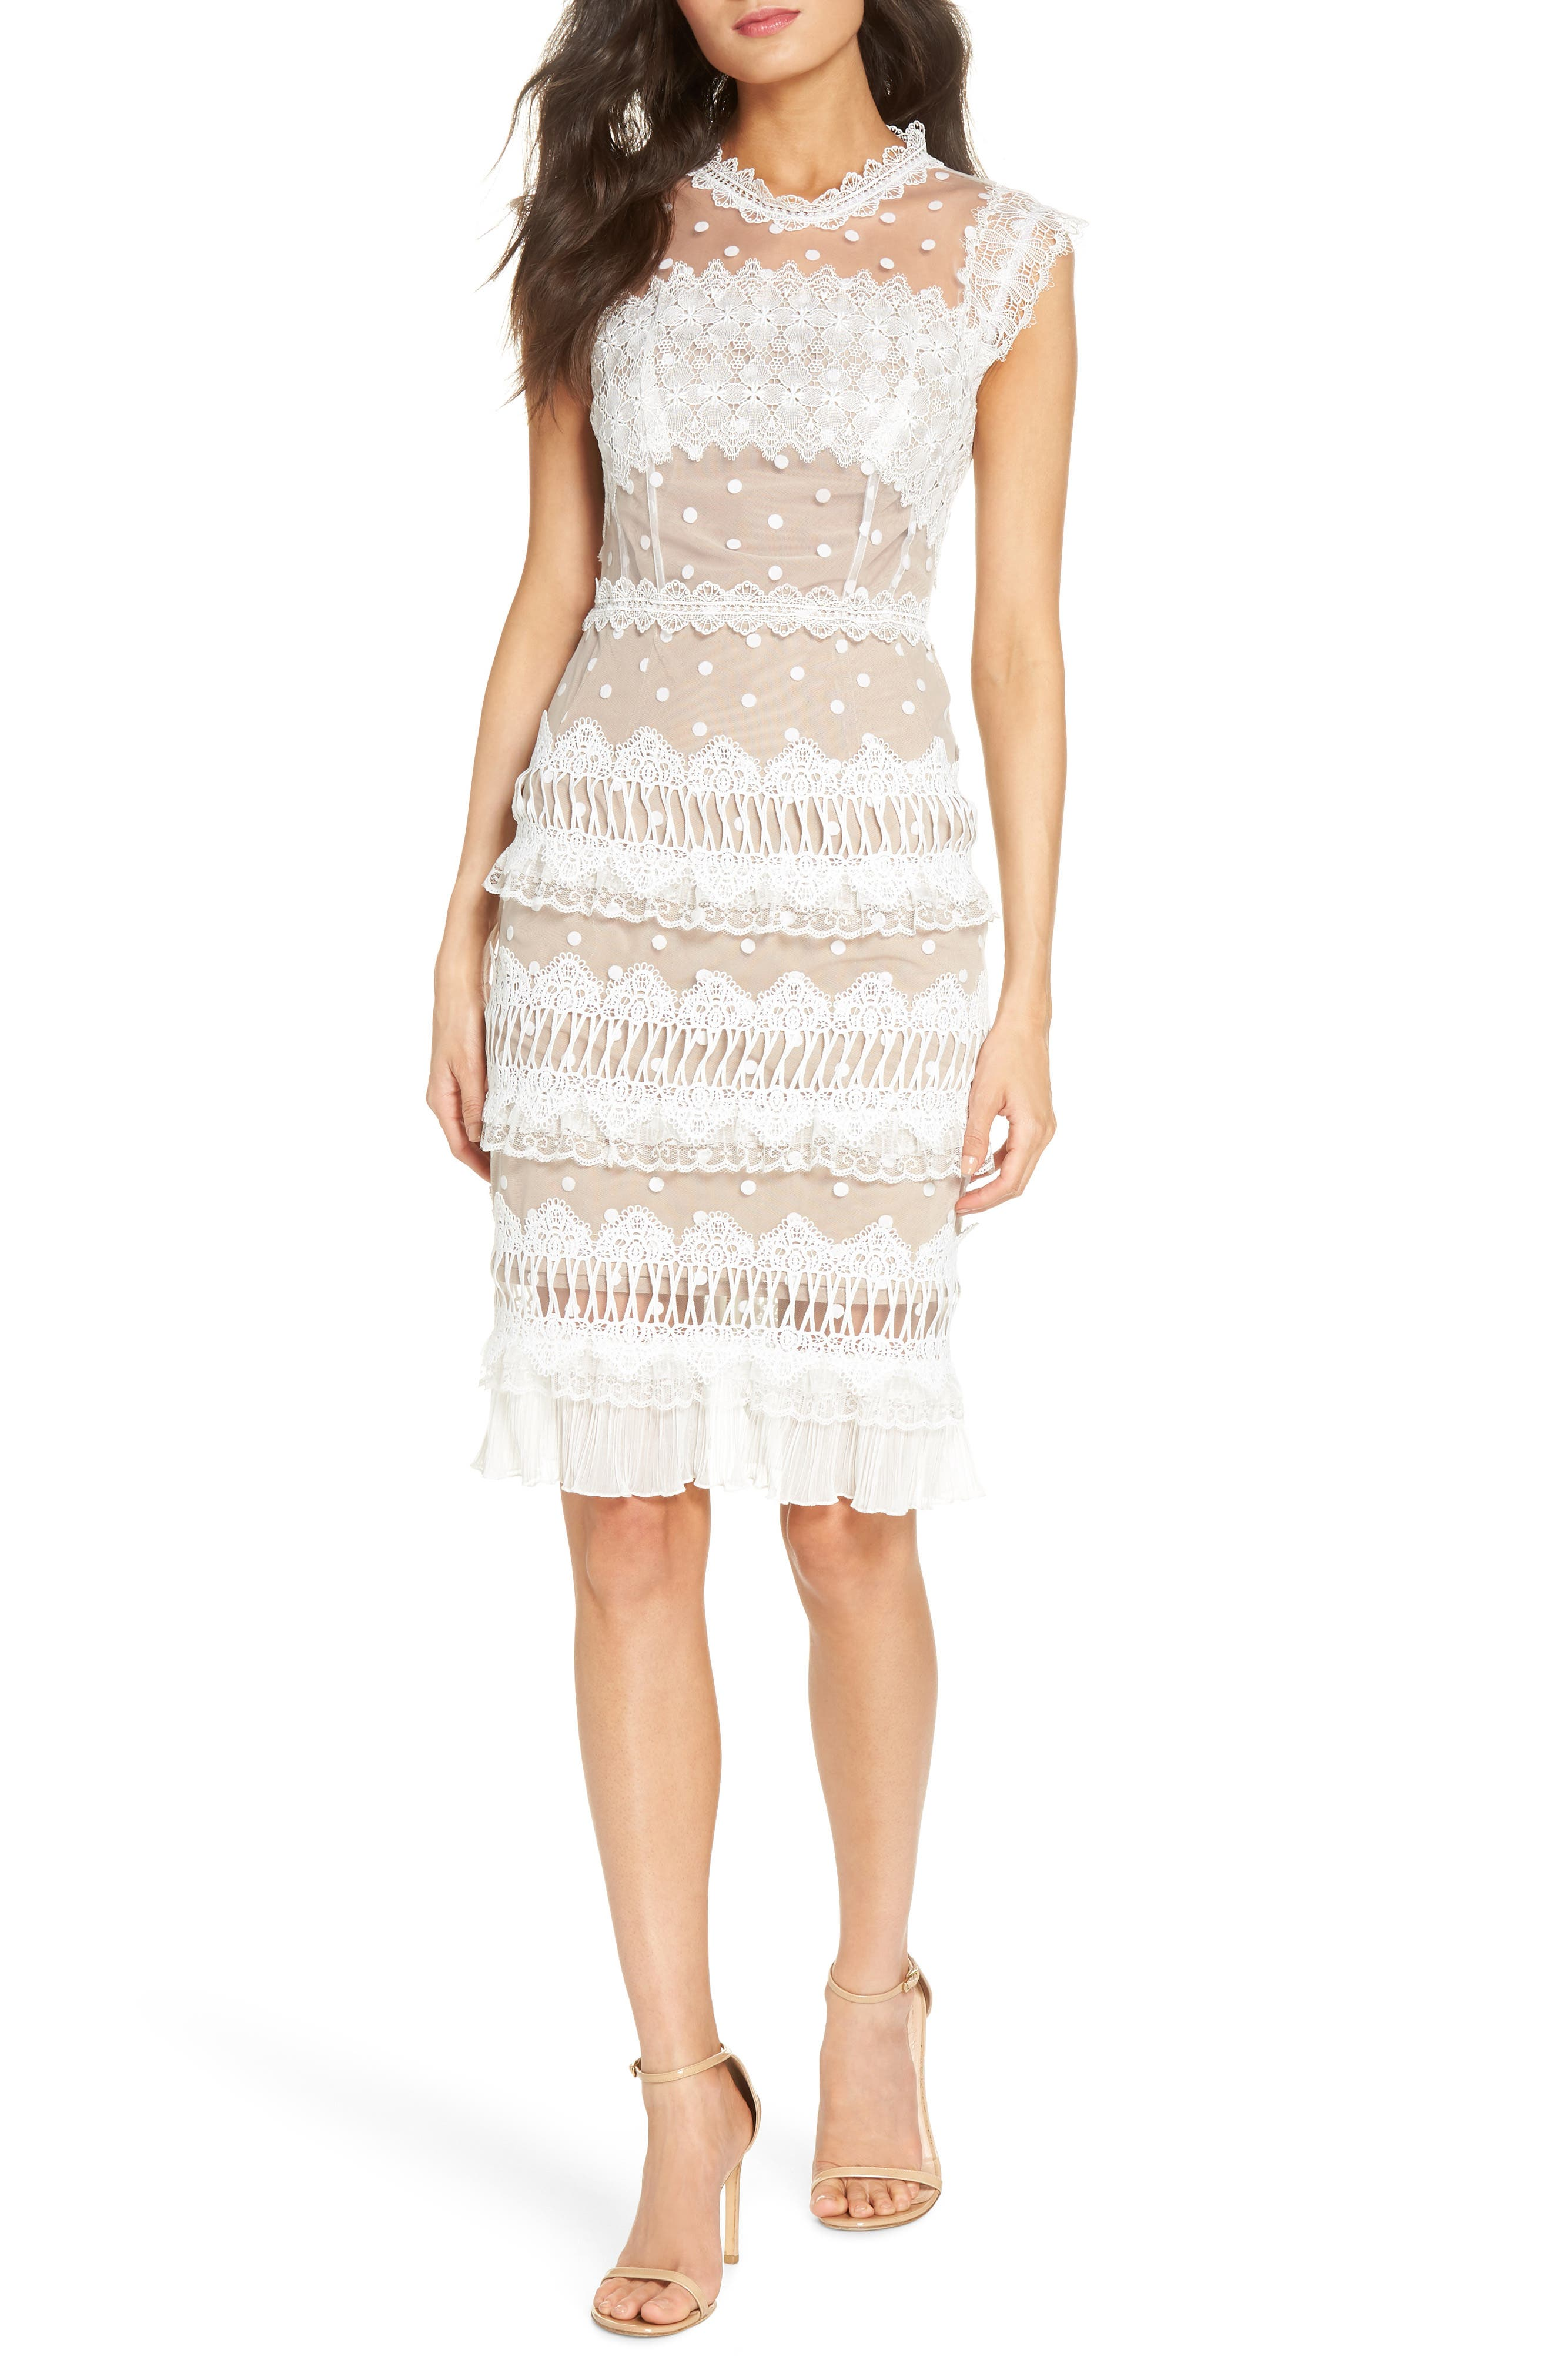 Majiorca Dot Lace Cocktail Dress,                             Main thumbnail 1, color,                             White